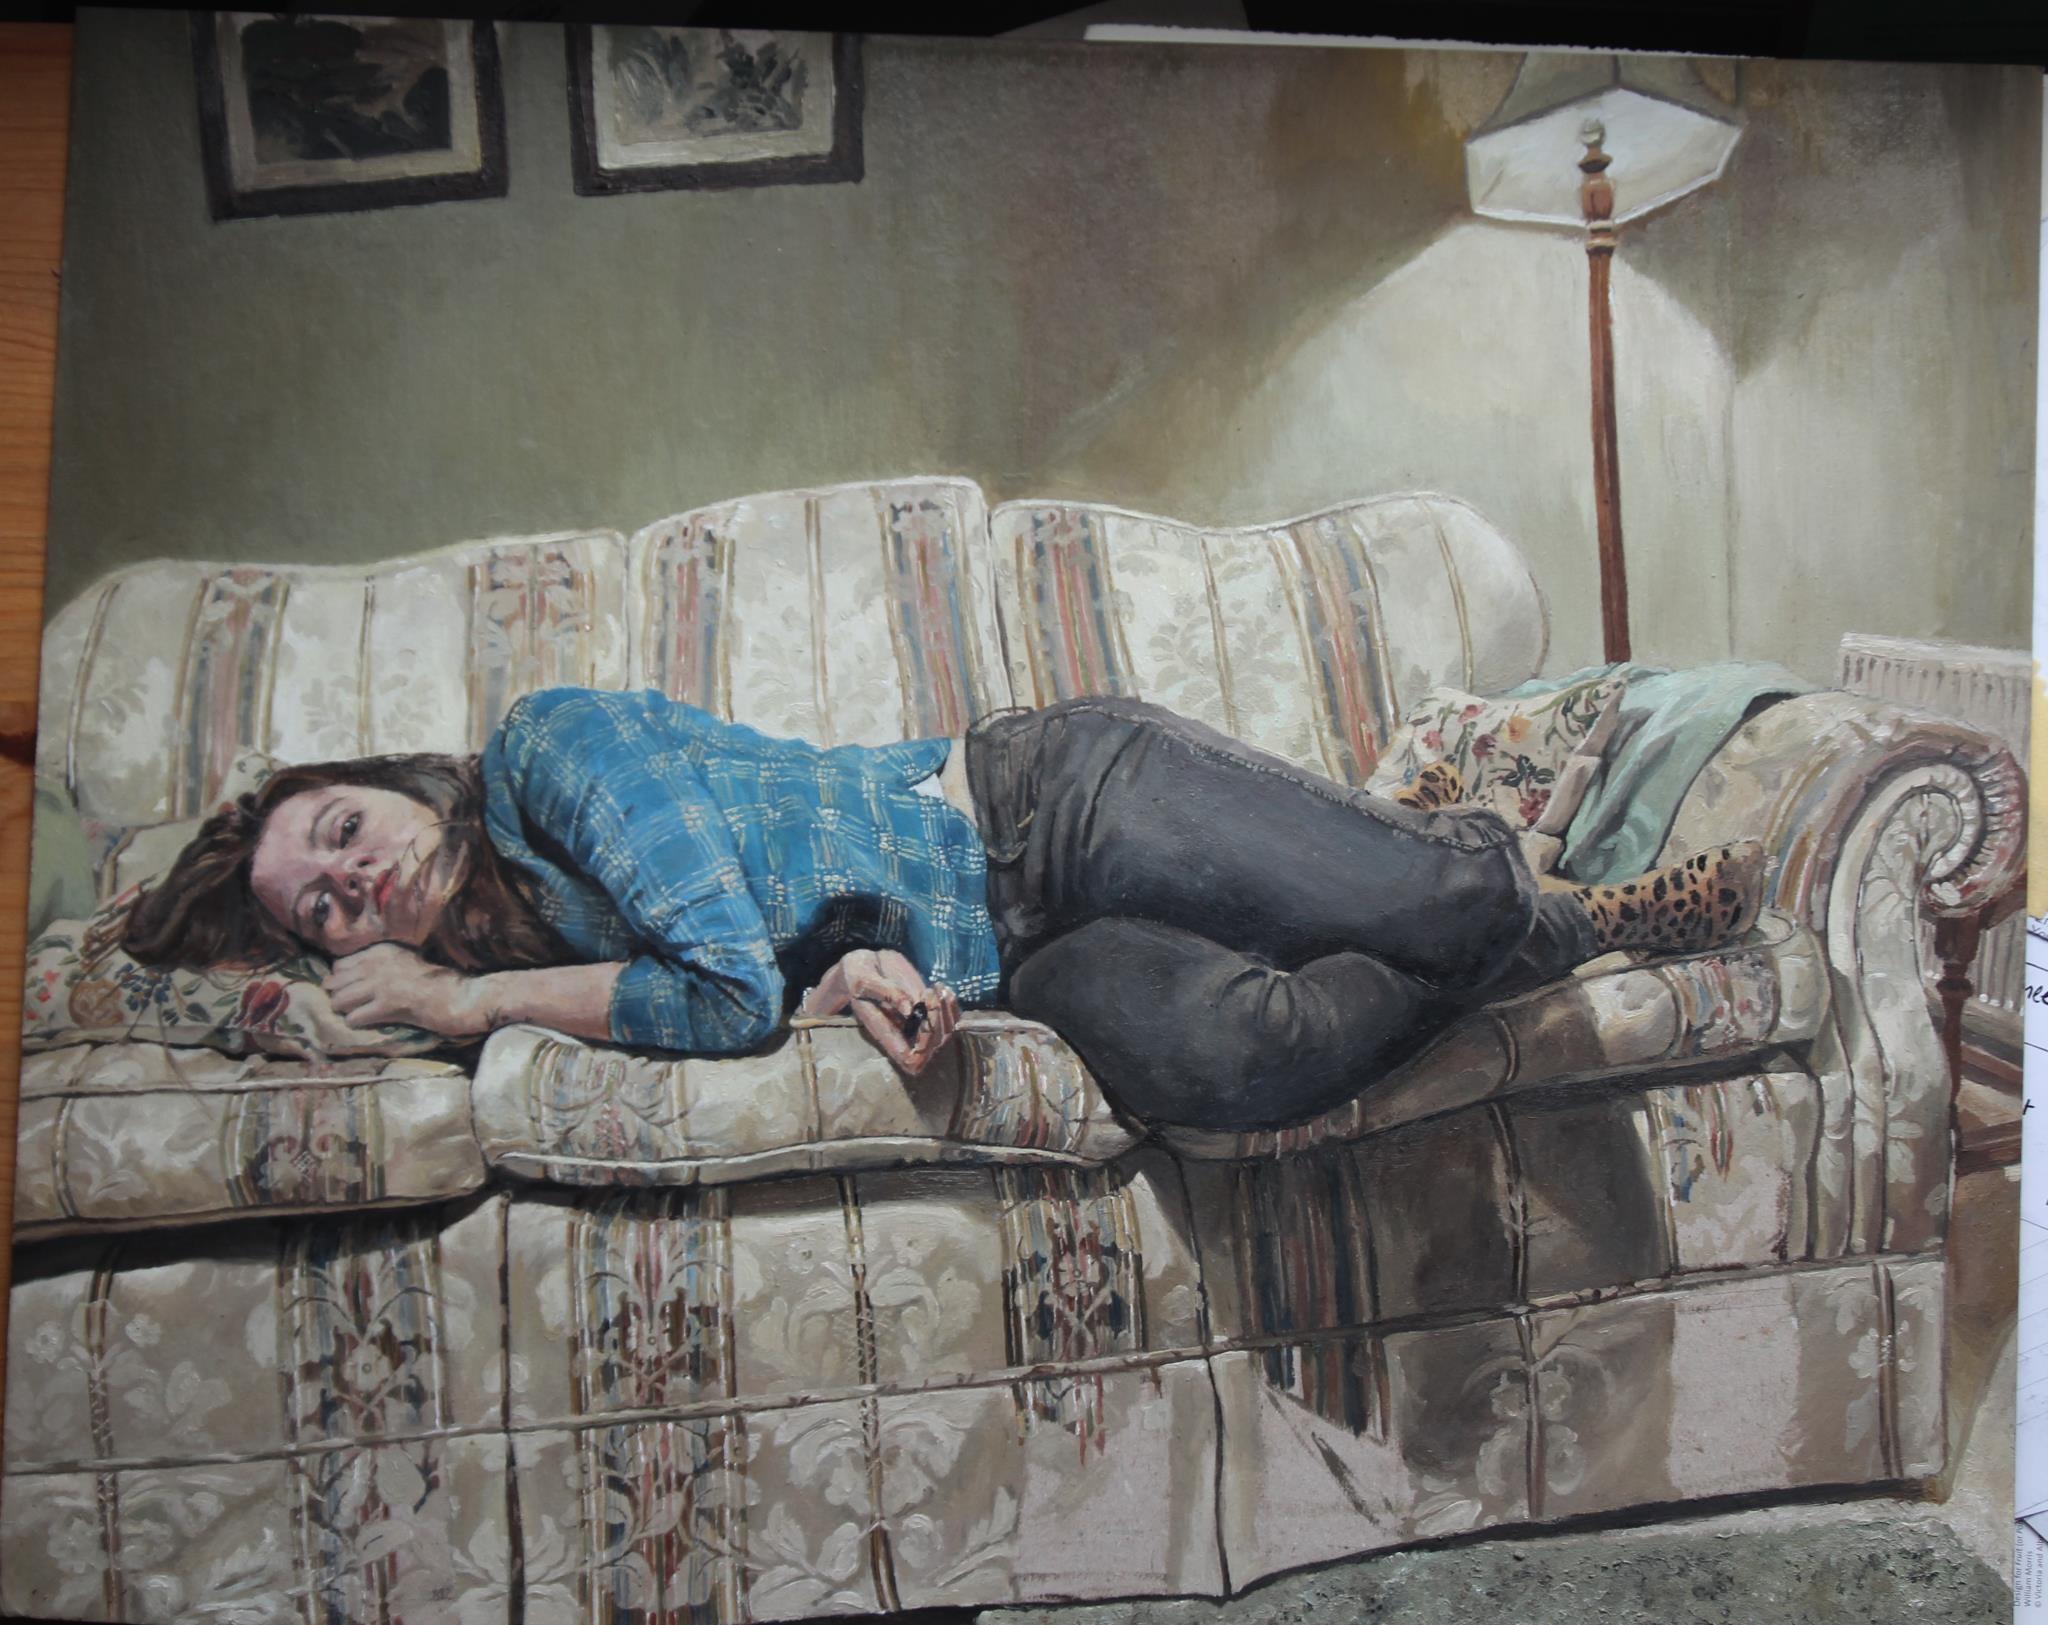 Amy Gaudion